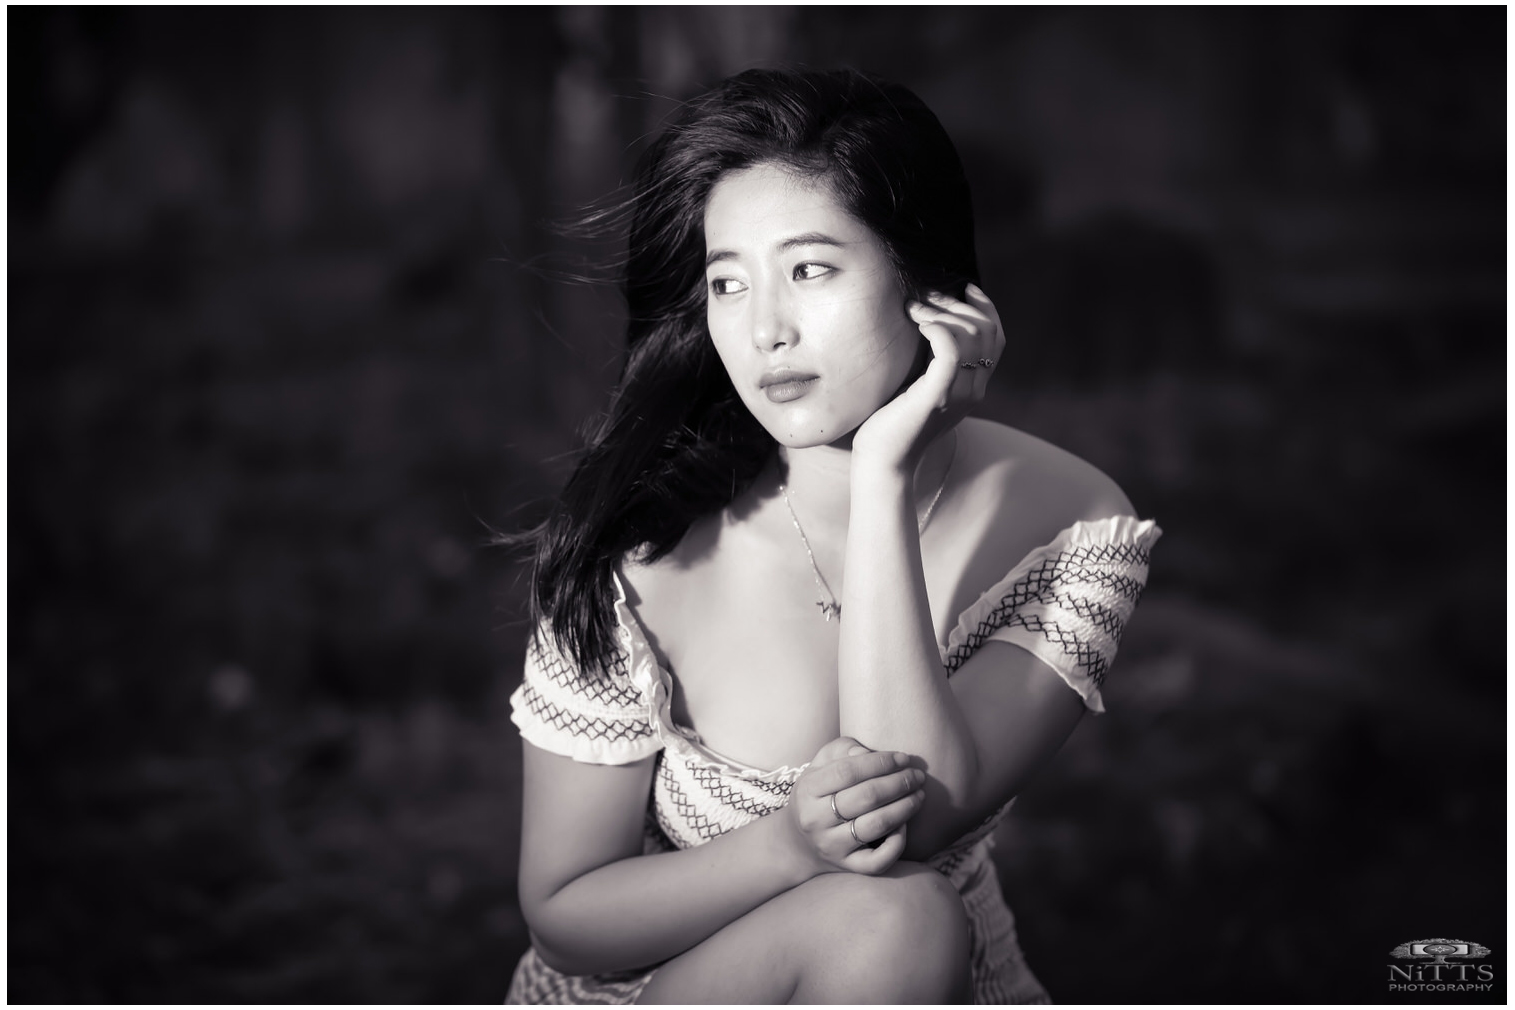 Sexy_Sensual_Female_Model_Beautiful_Girl_Monochrome_Black and White.jpg